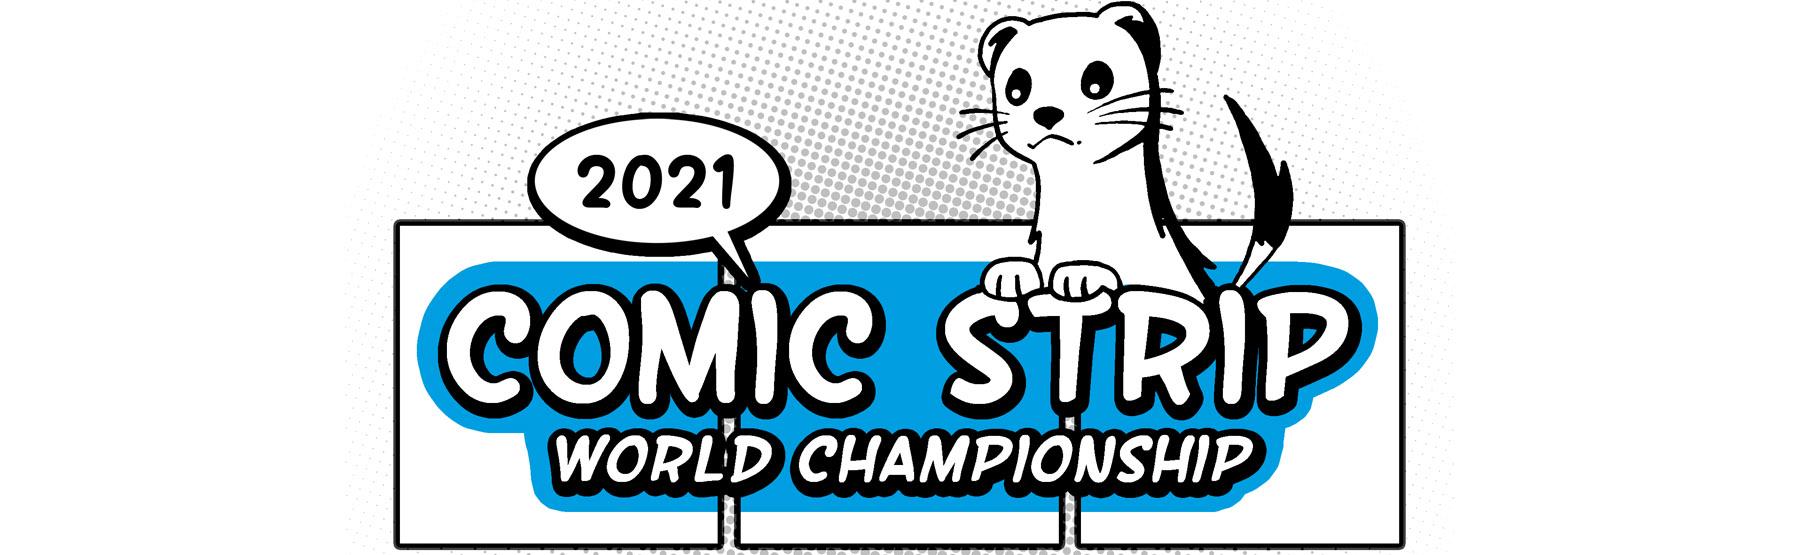 Comic Strip World Championship 2021